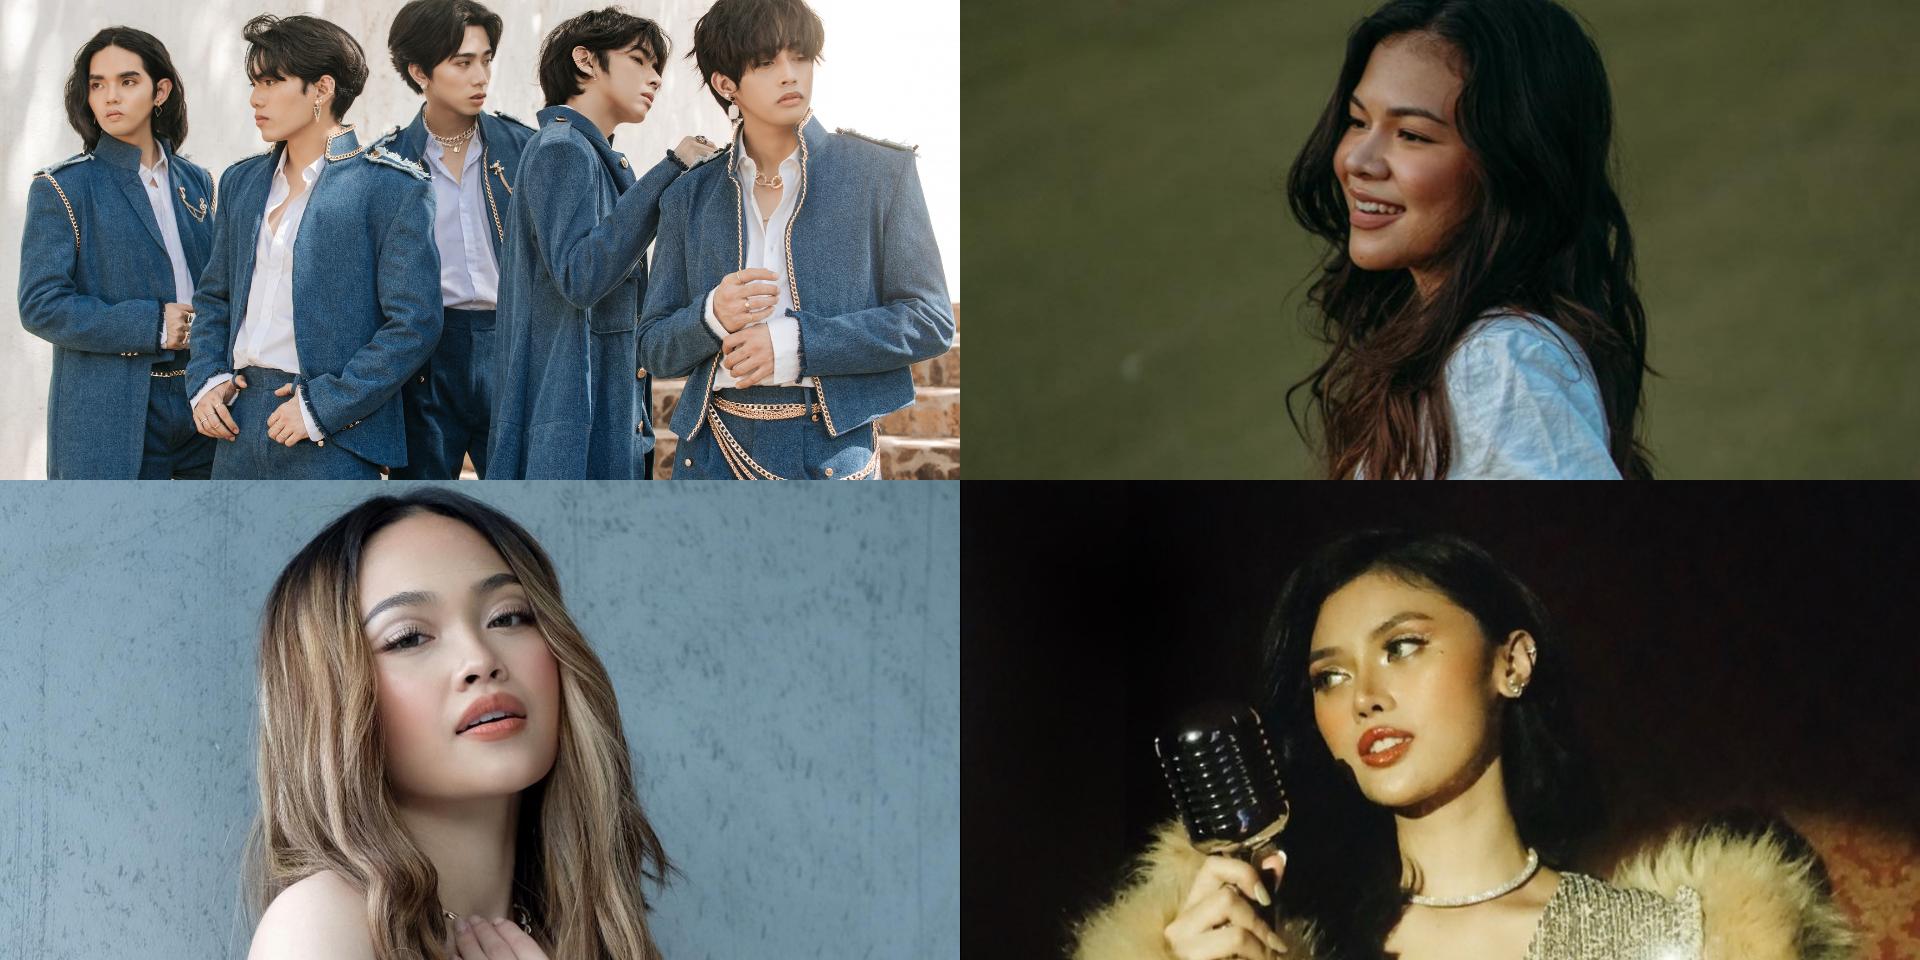 YouTube FanFest reveals lineup – SB19, AC Bonifacio, Lesha, Reneé Dominique, Zack Tabudlo, and more